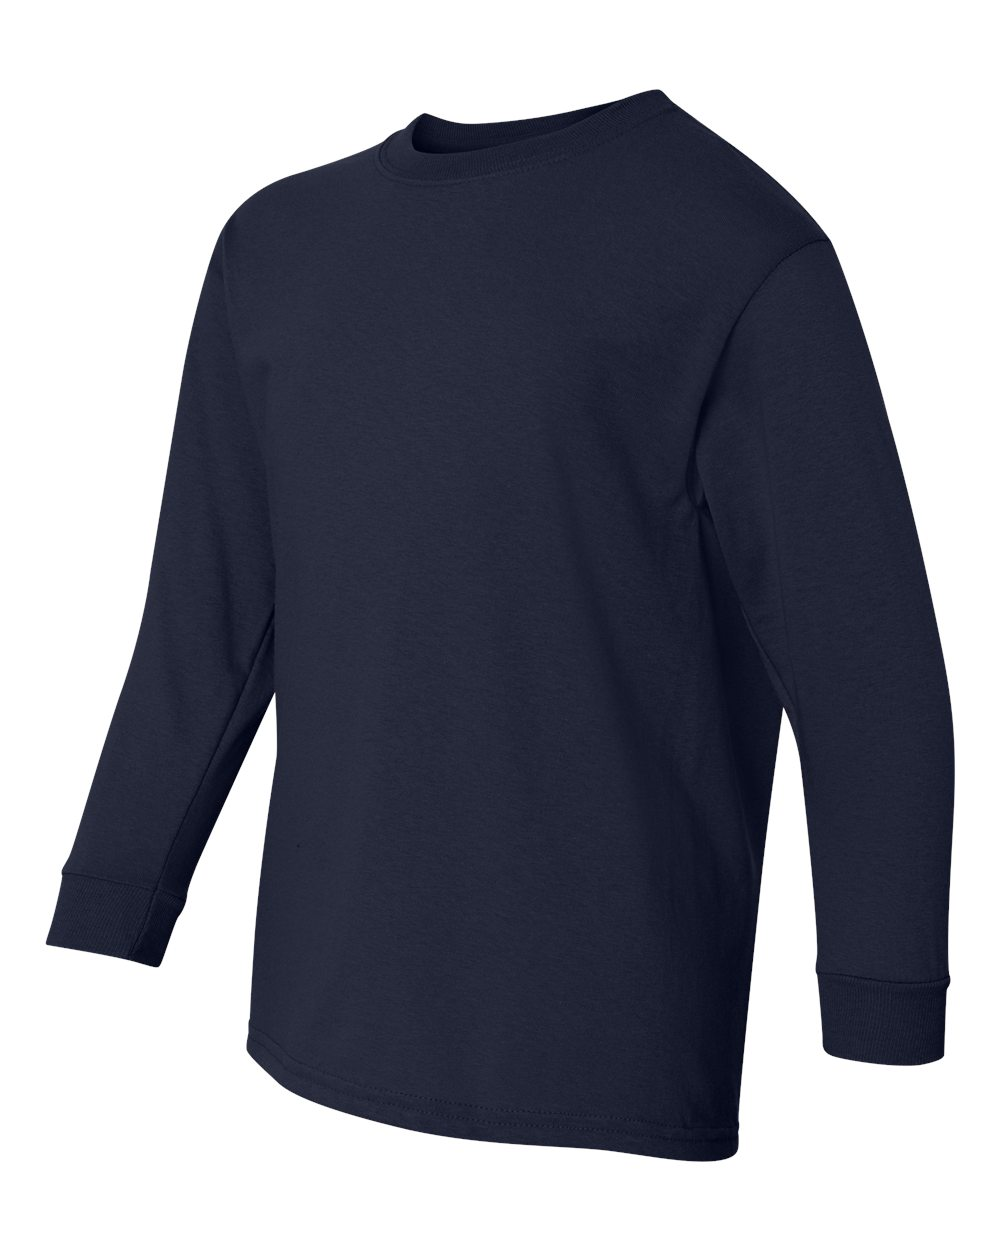 Gildan 5400b Heavy Cotton Youth Long Sleeve T Shirt